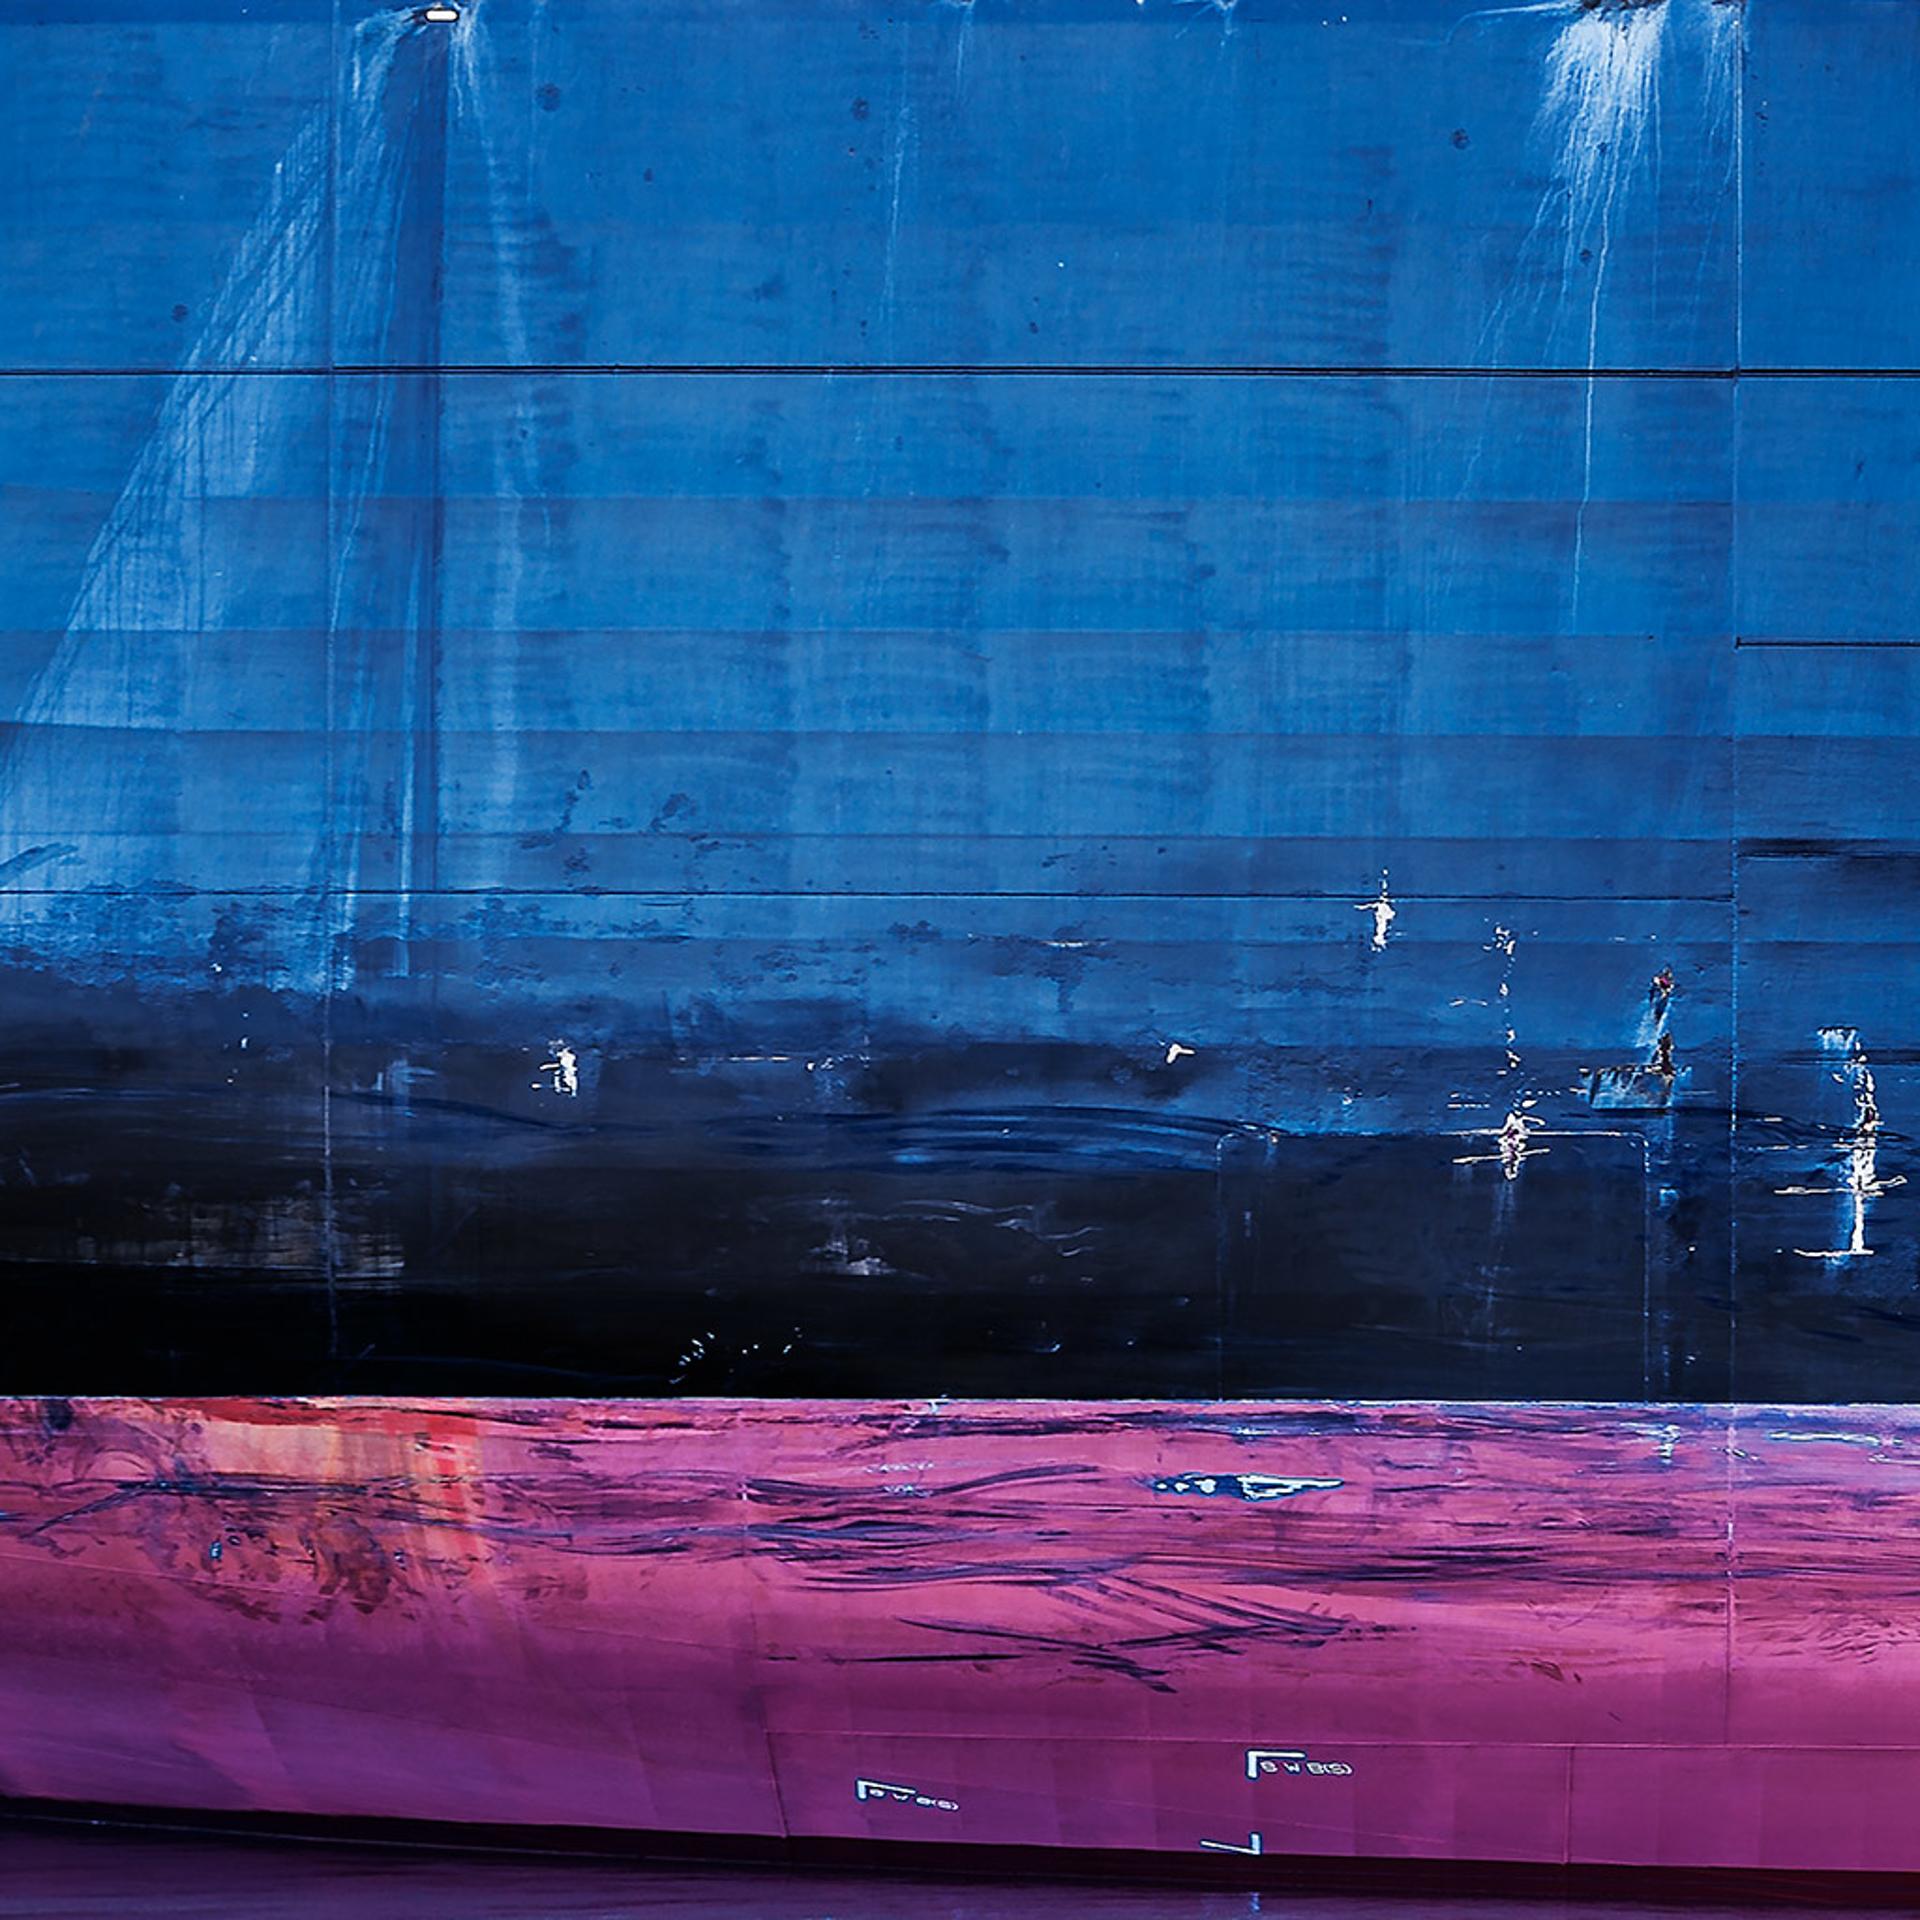 Rothko Series 2: BD-3-3 by Dan Kaufman